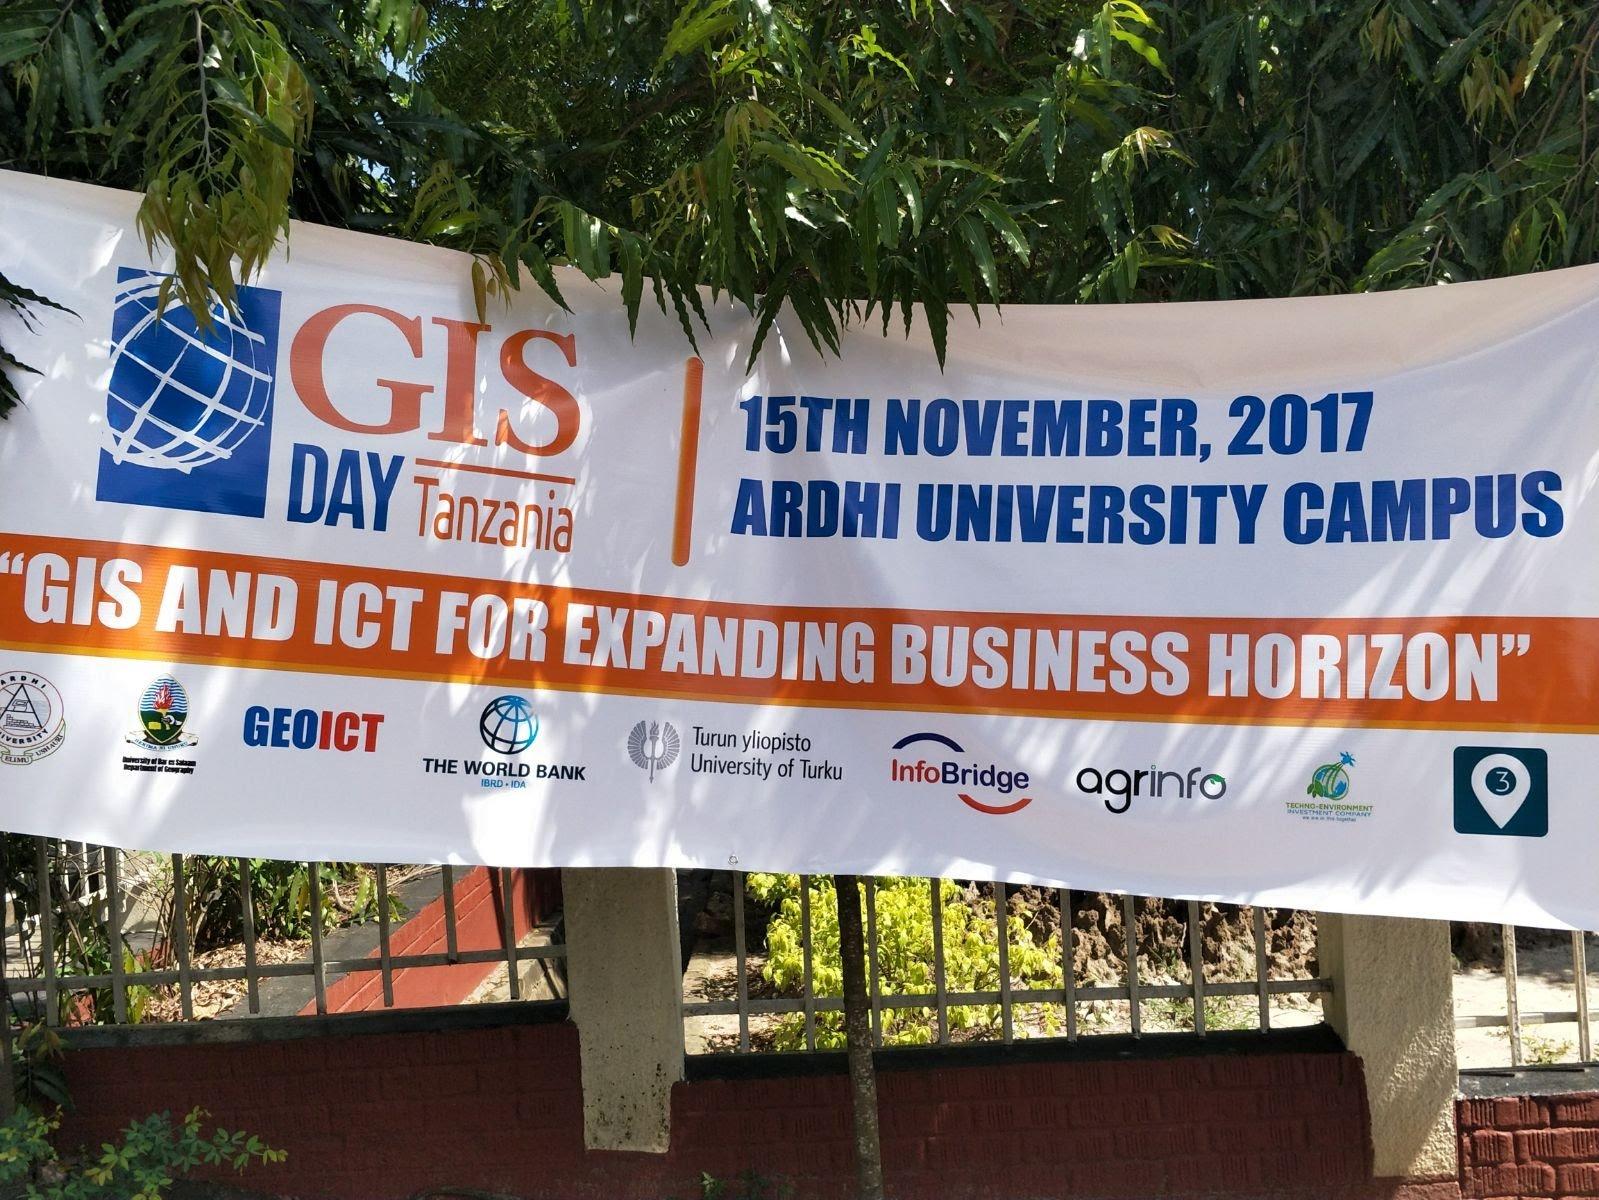 GIS day Tanzania